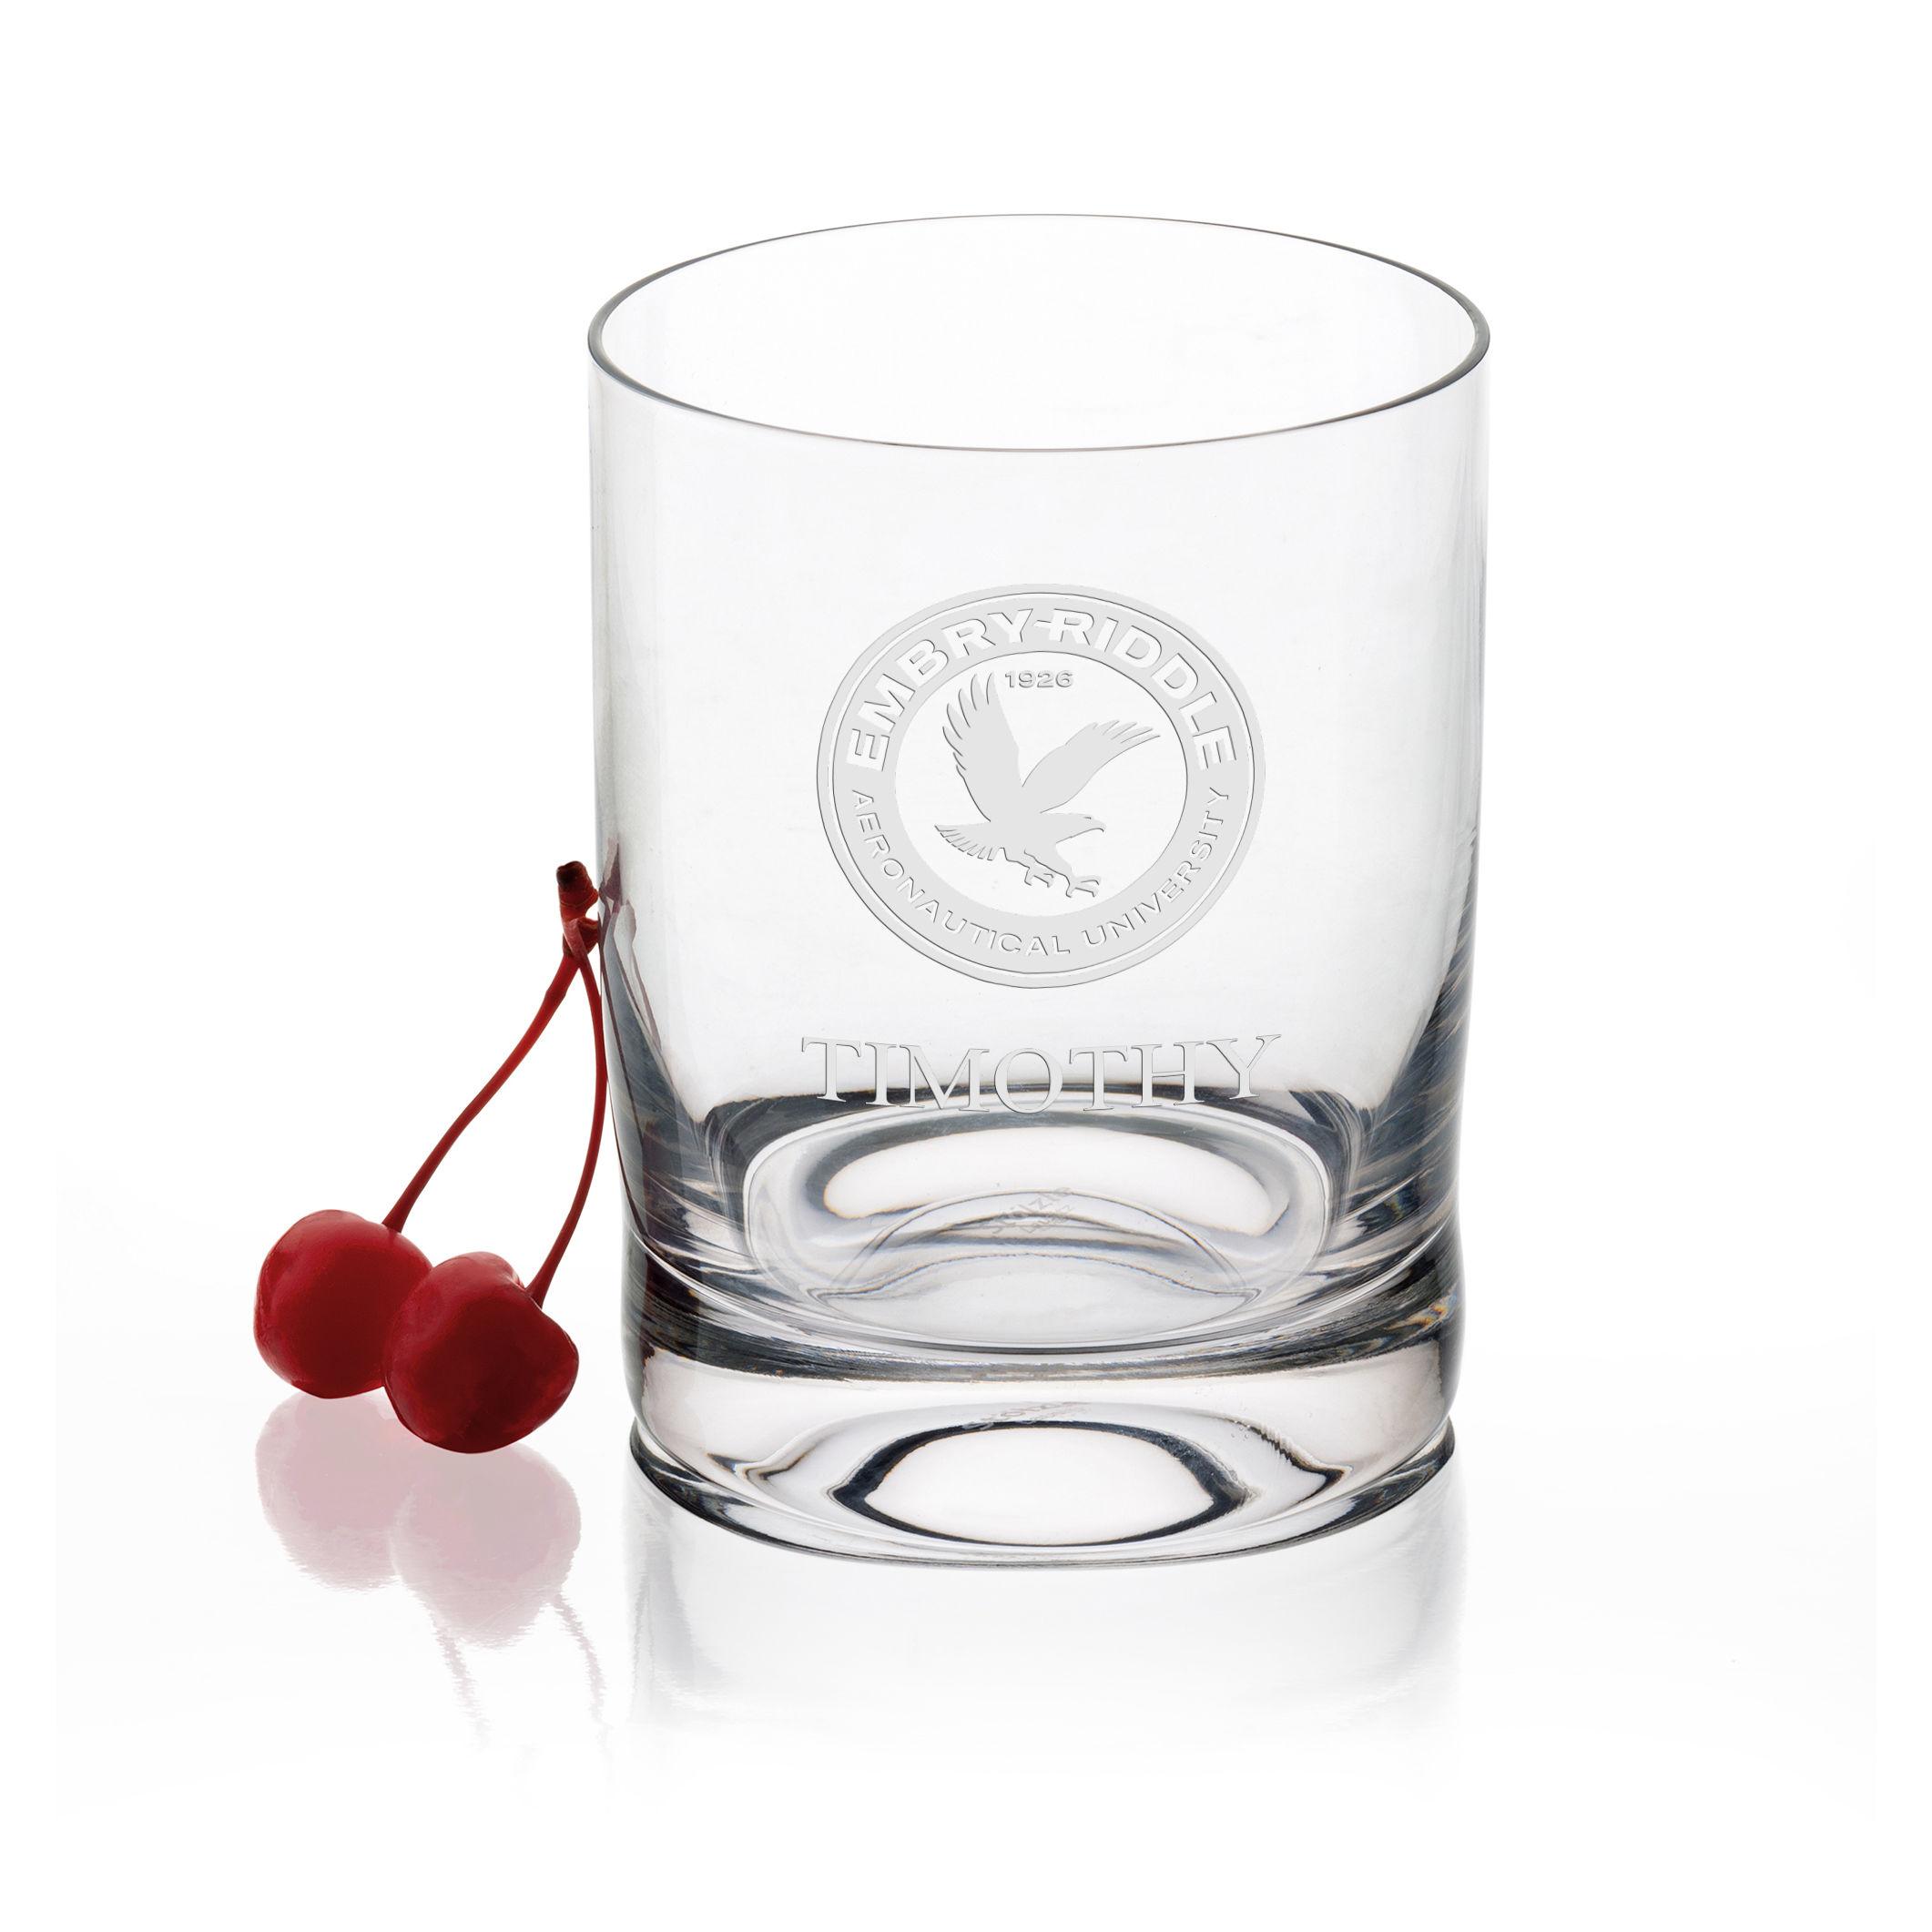 Embry-Riddle Tumbler Glasses - Set of 2